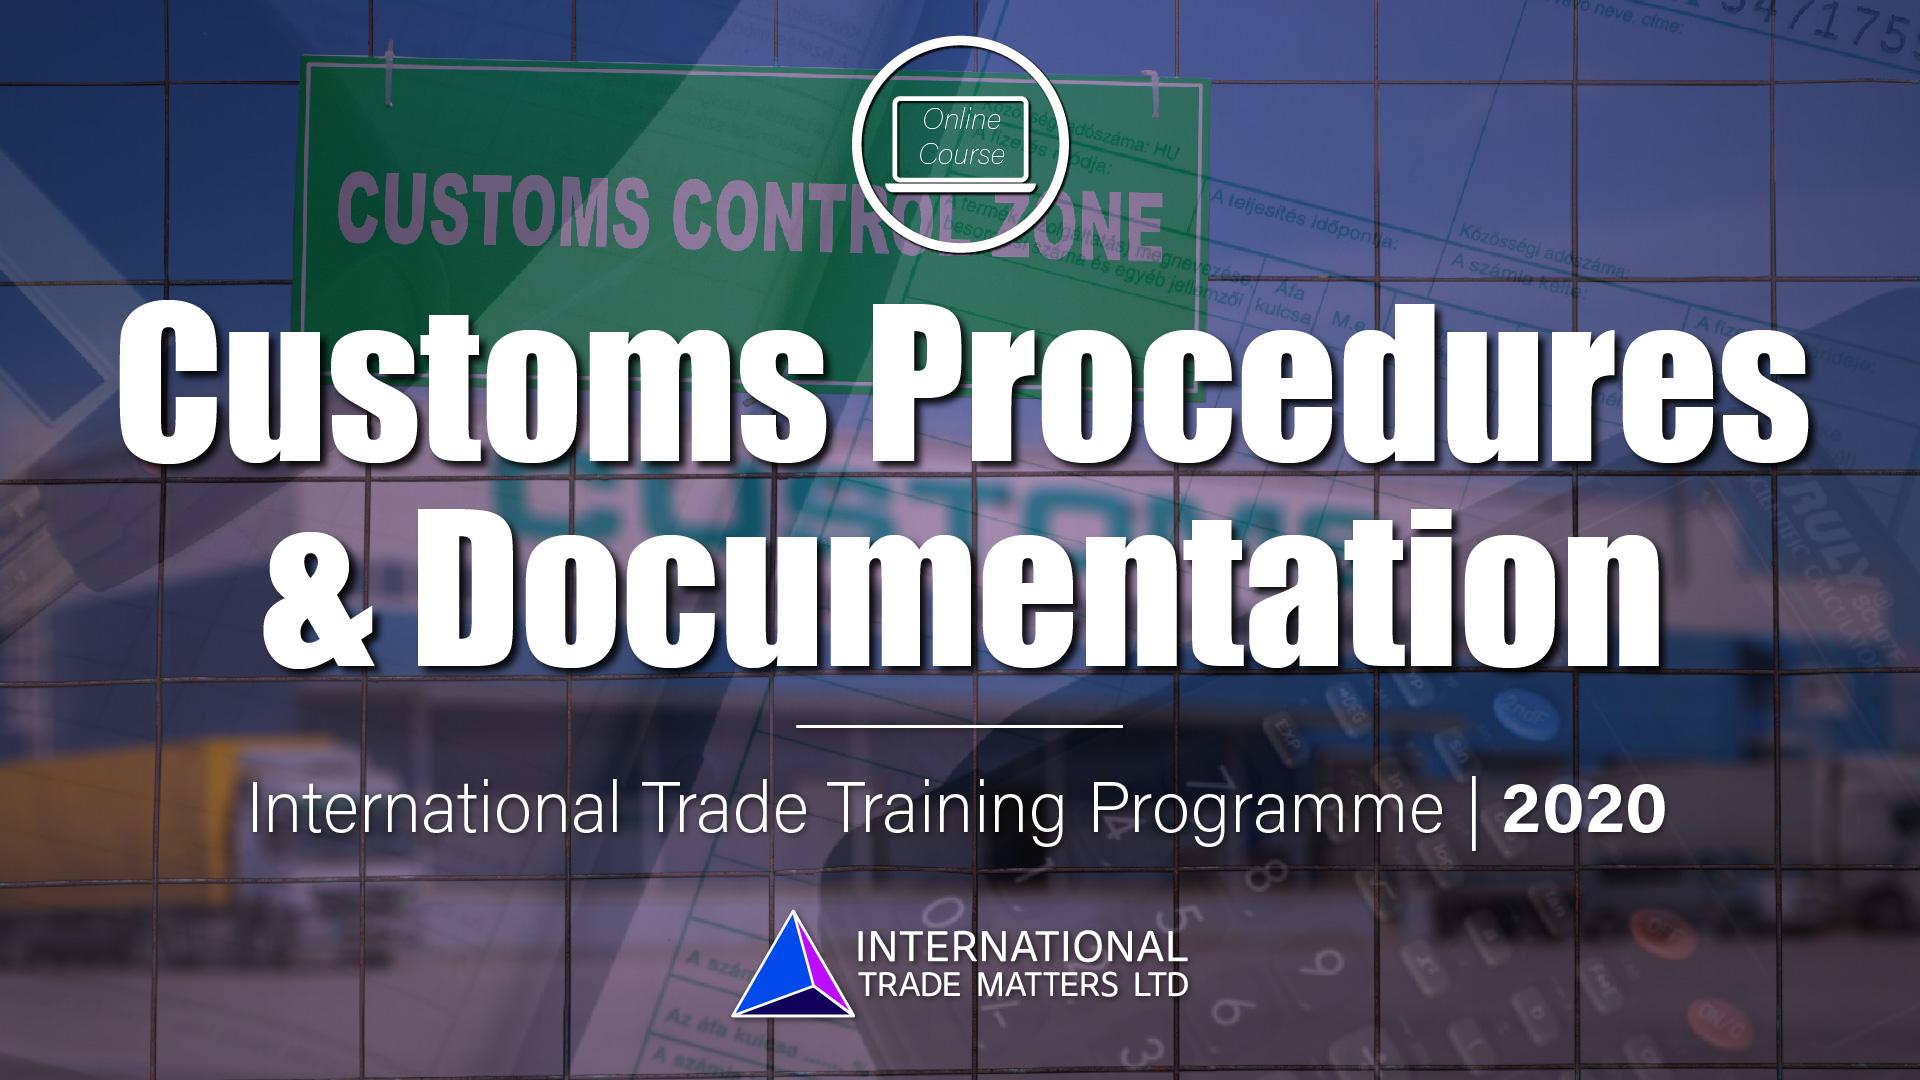 Customs Procedures and Documentation Course